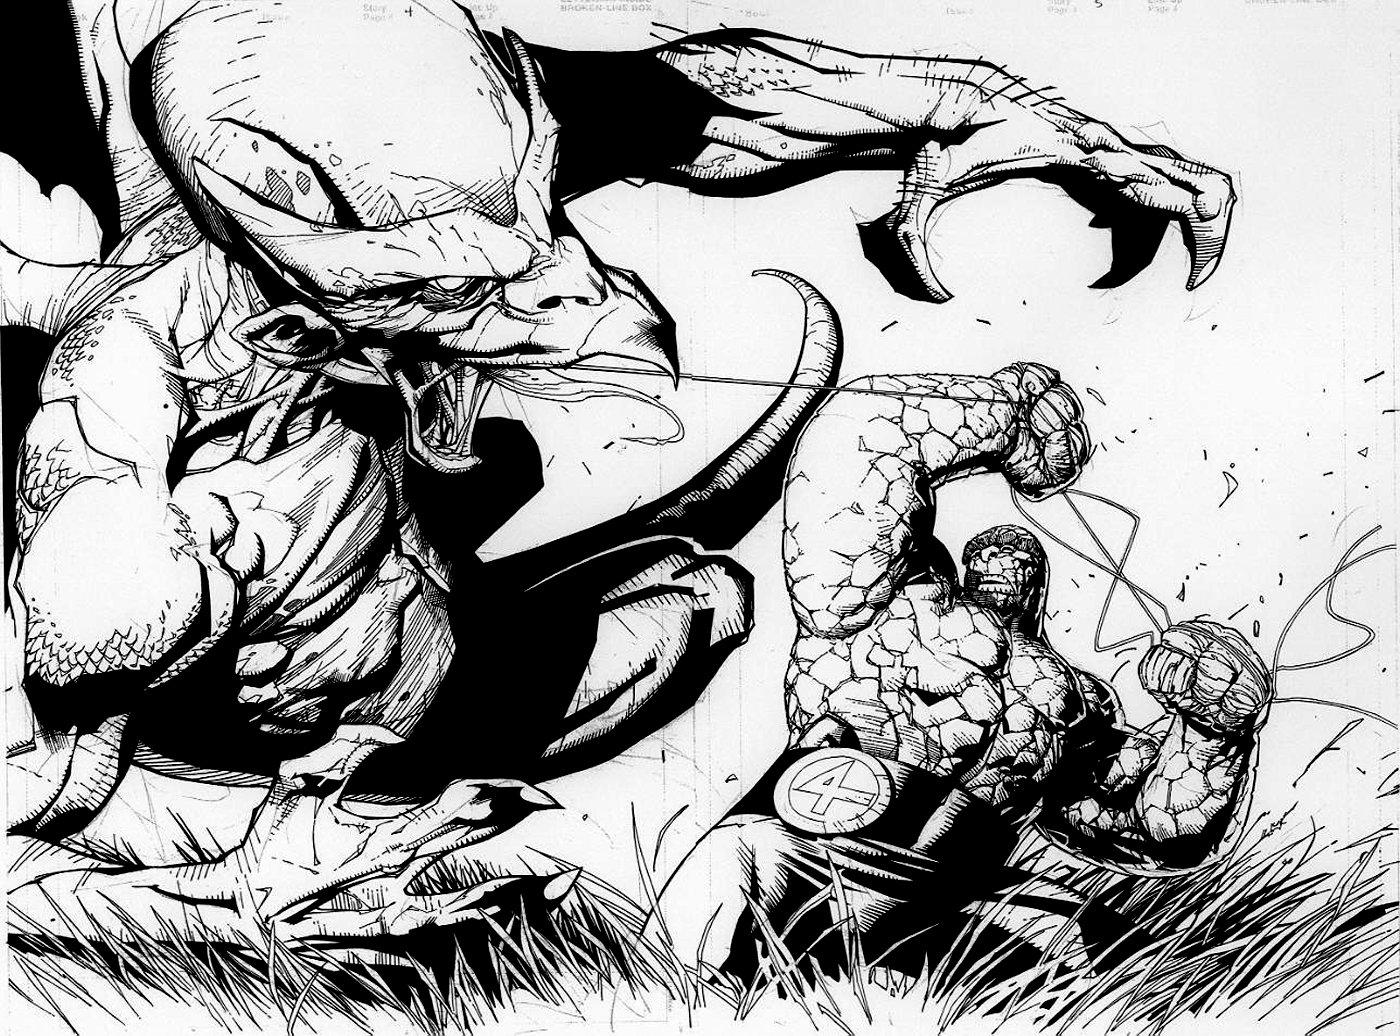 Fantastic Four 2001 p 36-37 Double Spread Splash (Thing Battles Dragon Man!)